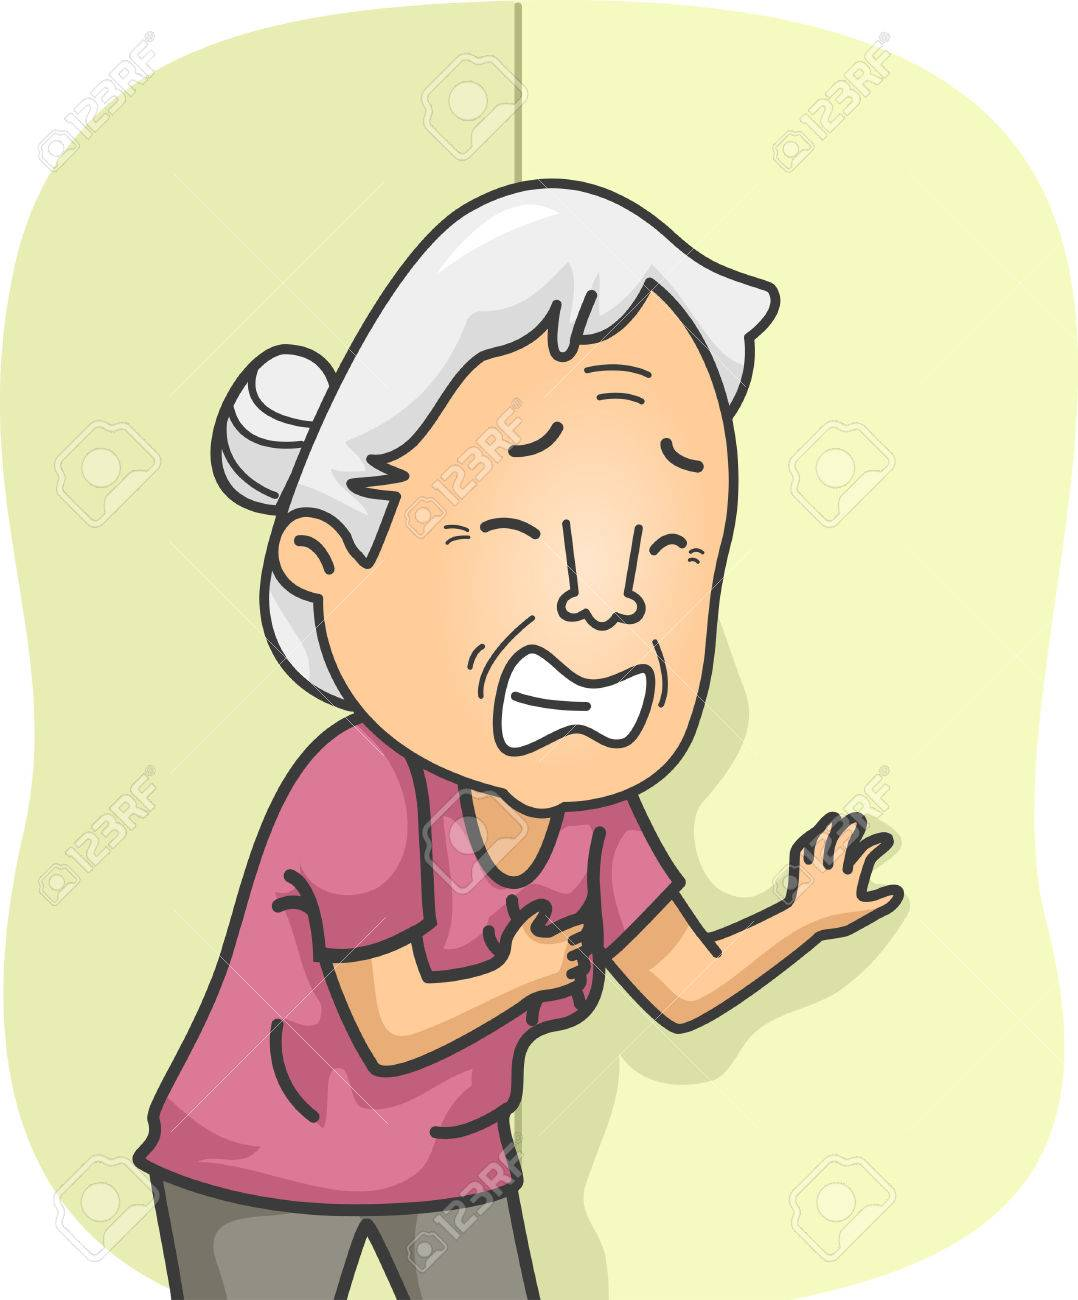 illustration featuring an elderly female having a heart attack rh 123rf com heart attack clipart free heart attack clipart free